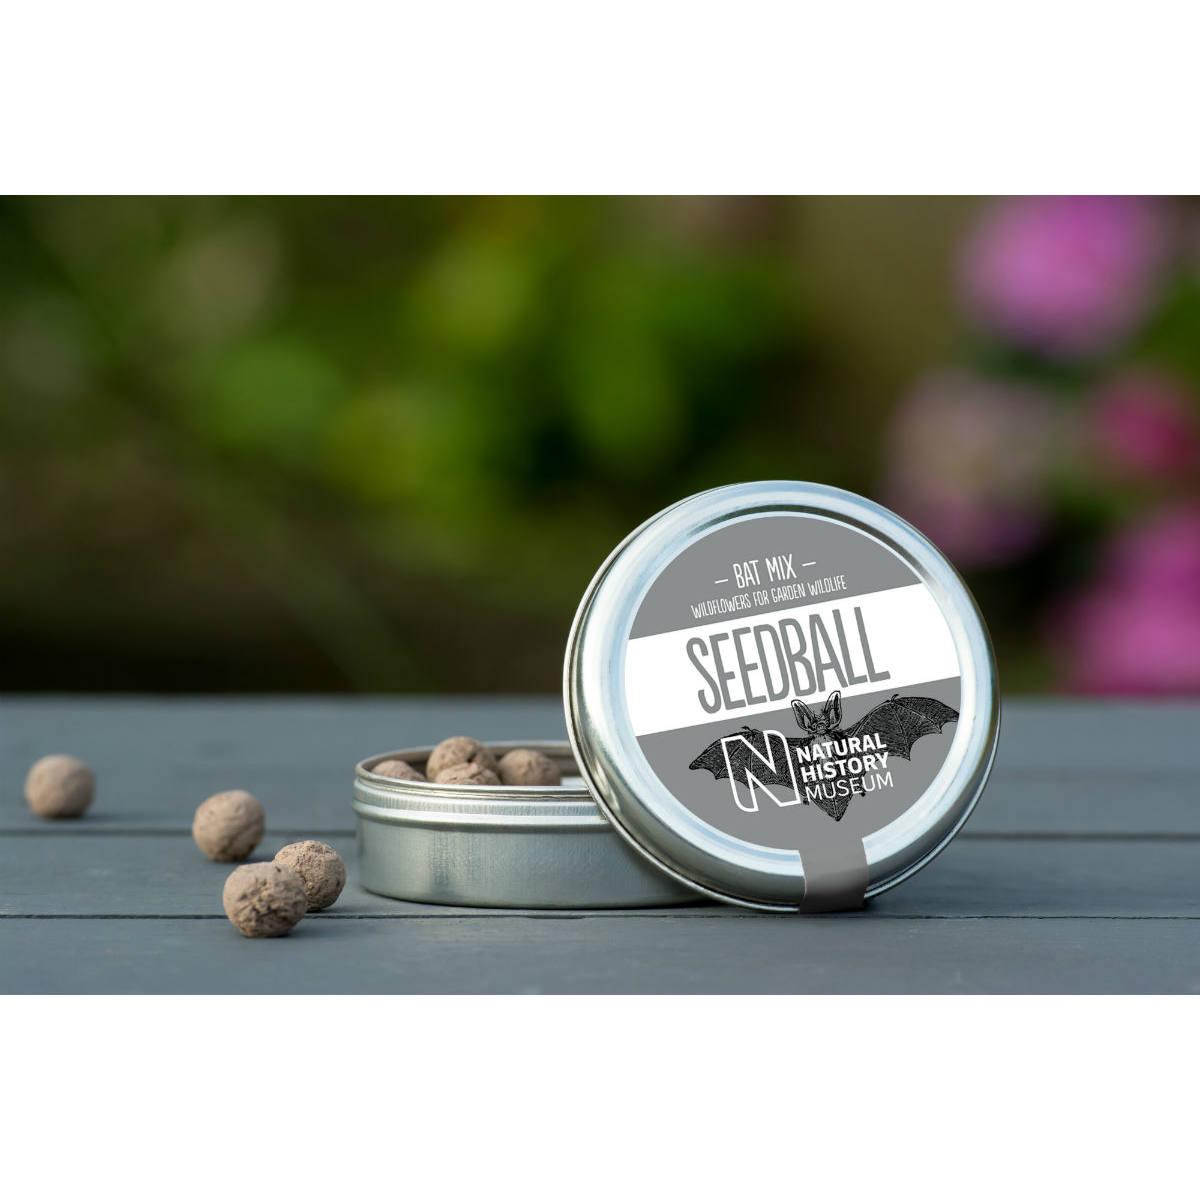 Seedball Bat Mix | Seeds for Bats | Restoration Yard